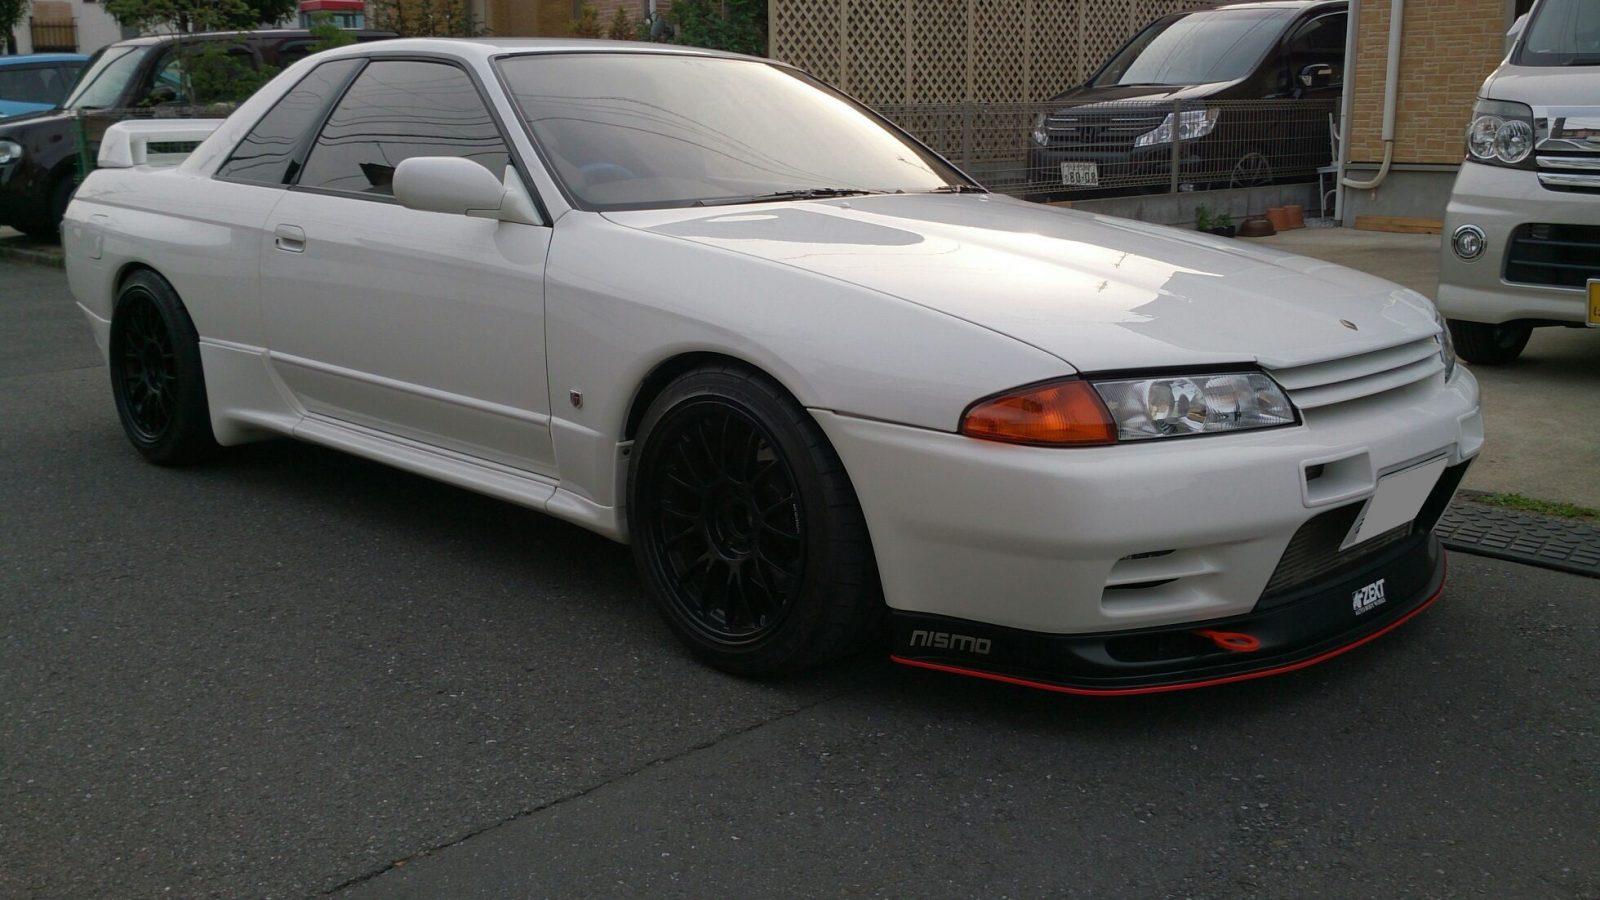 Nissan Skyline R32 Gtr Jap Imports Uk